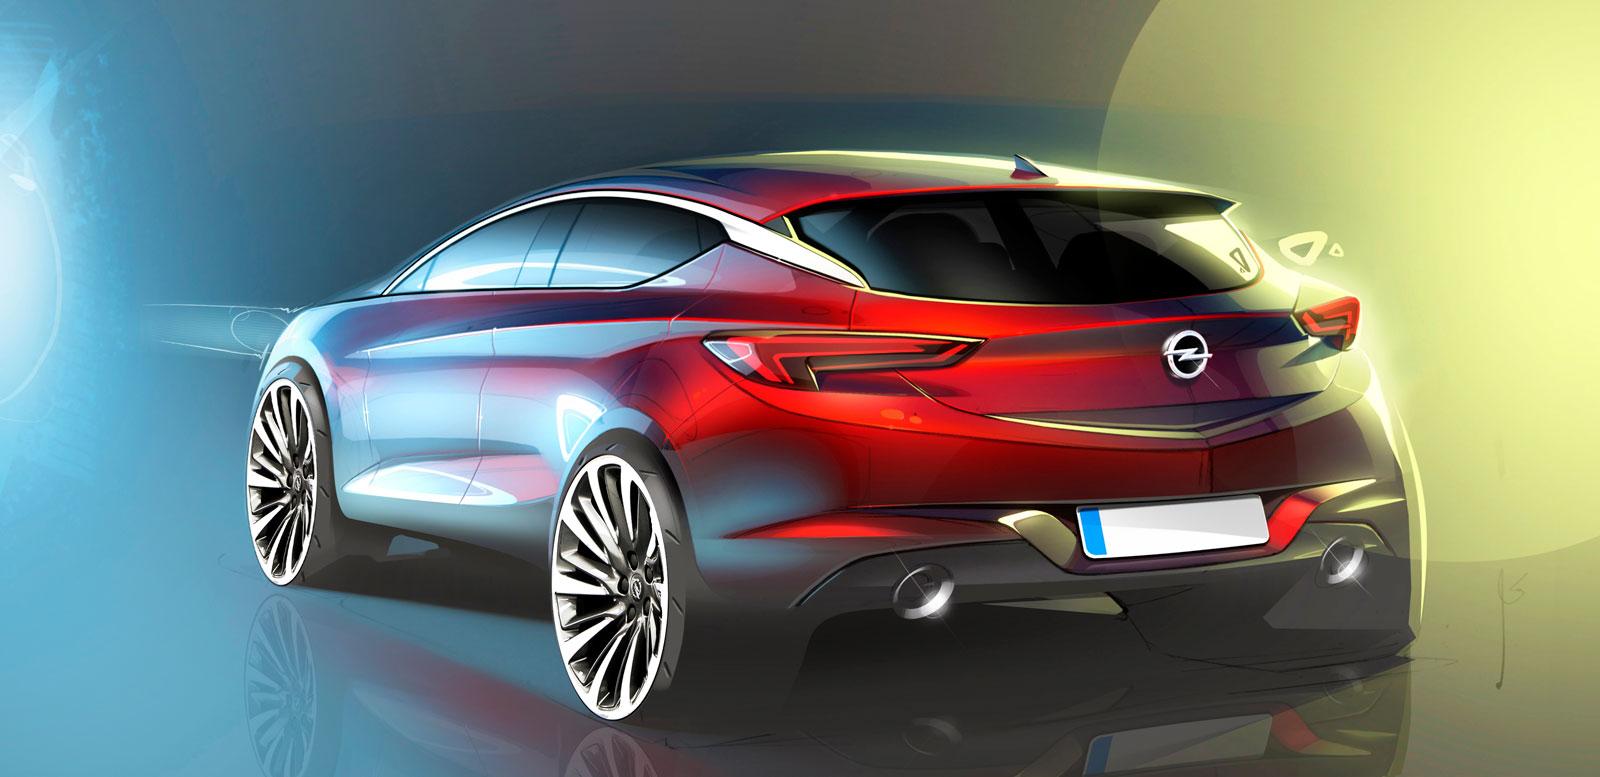 World Car Kia >> 2016 Opel Astra - Design Sketch - Car Body Design